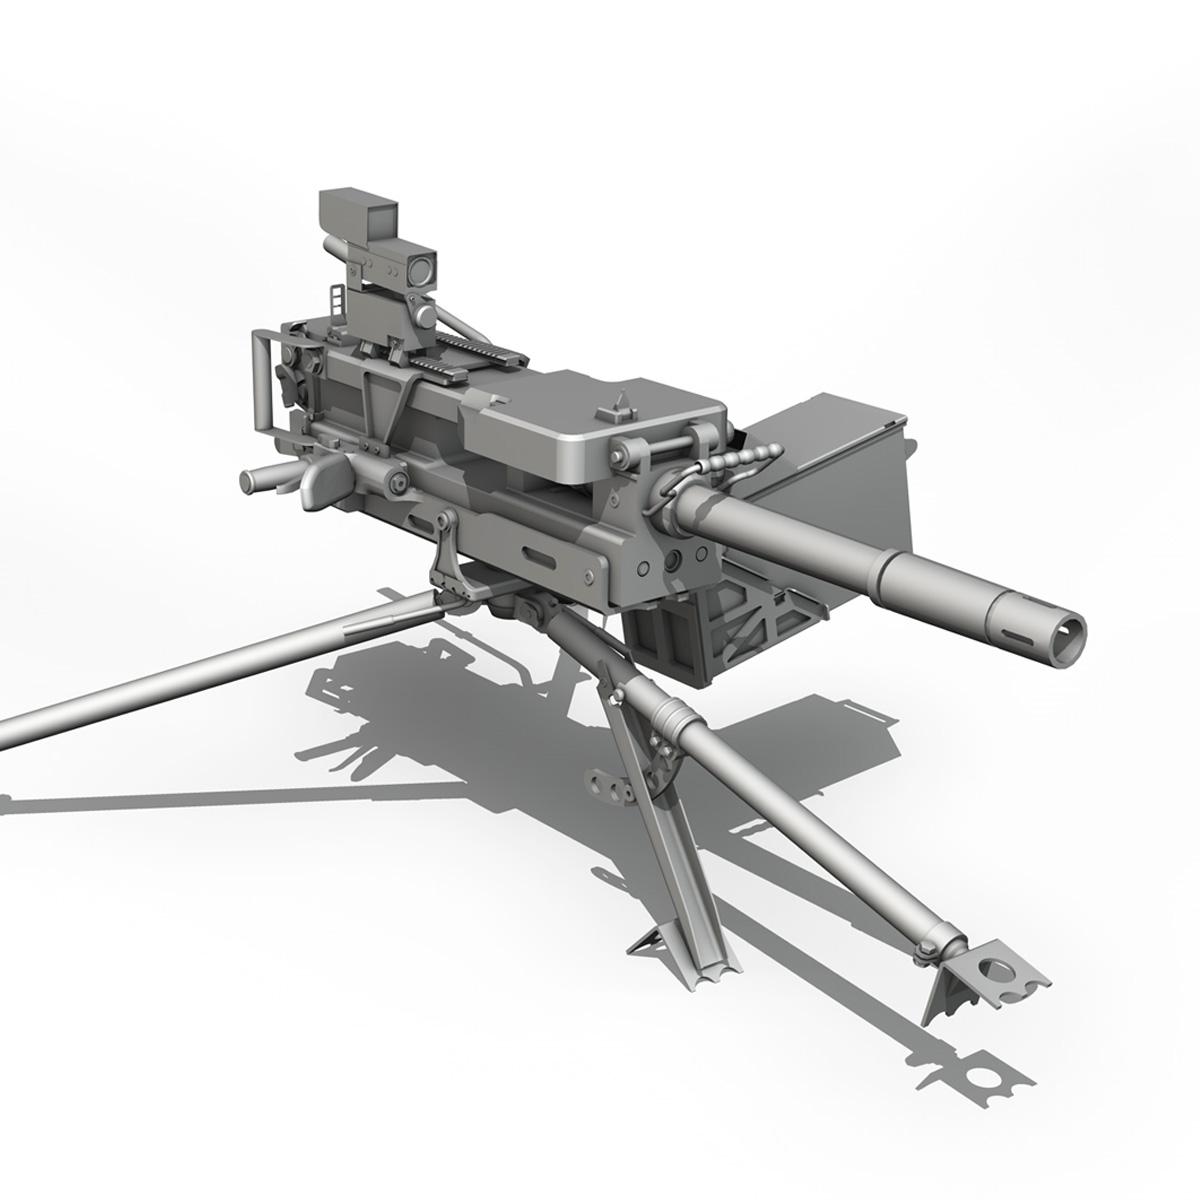 40mm qumbara pulemyotu gmg 3d model c4d lwo 3dm obj 264302